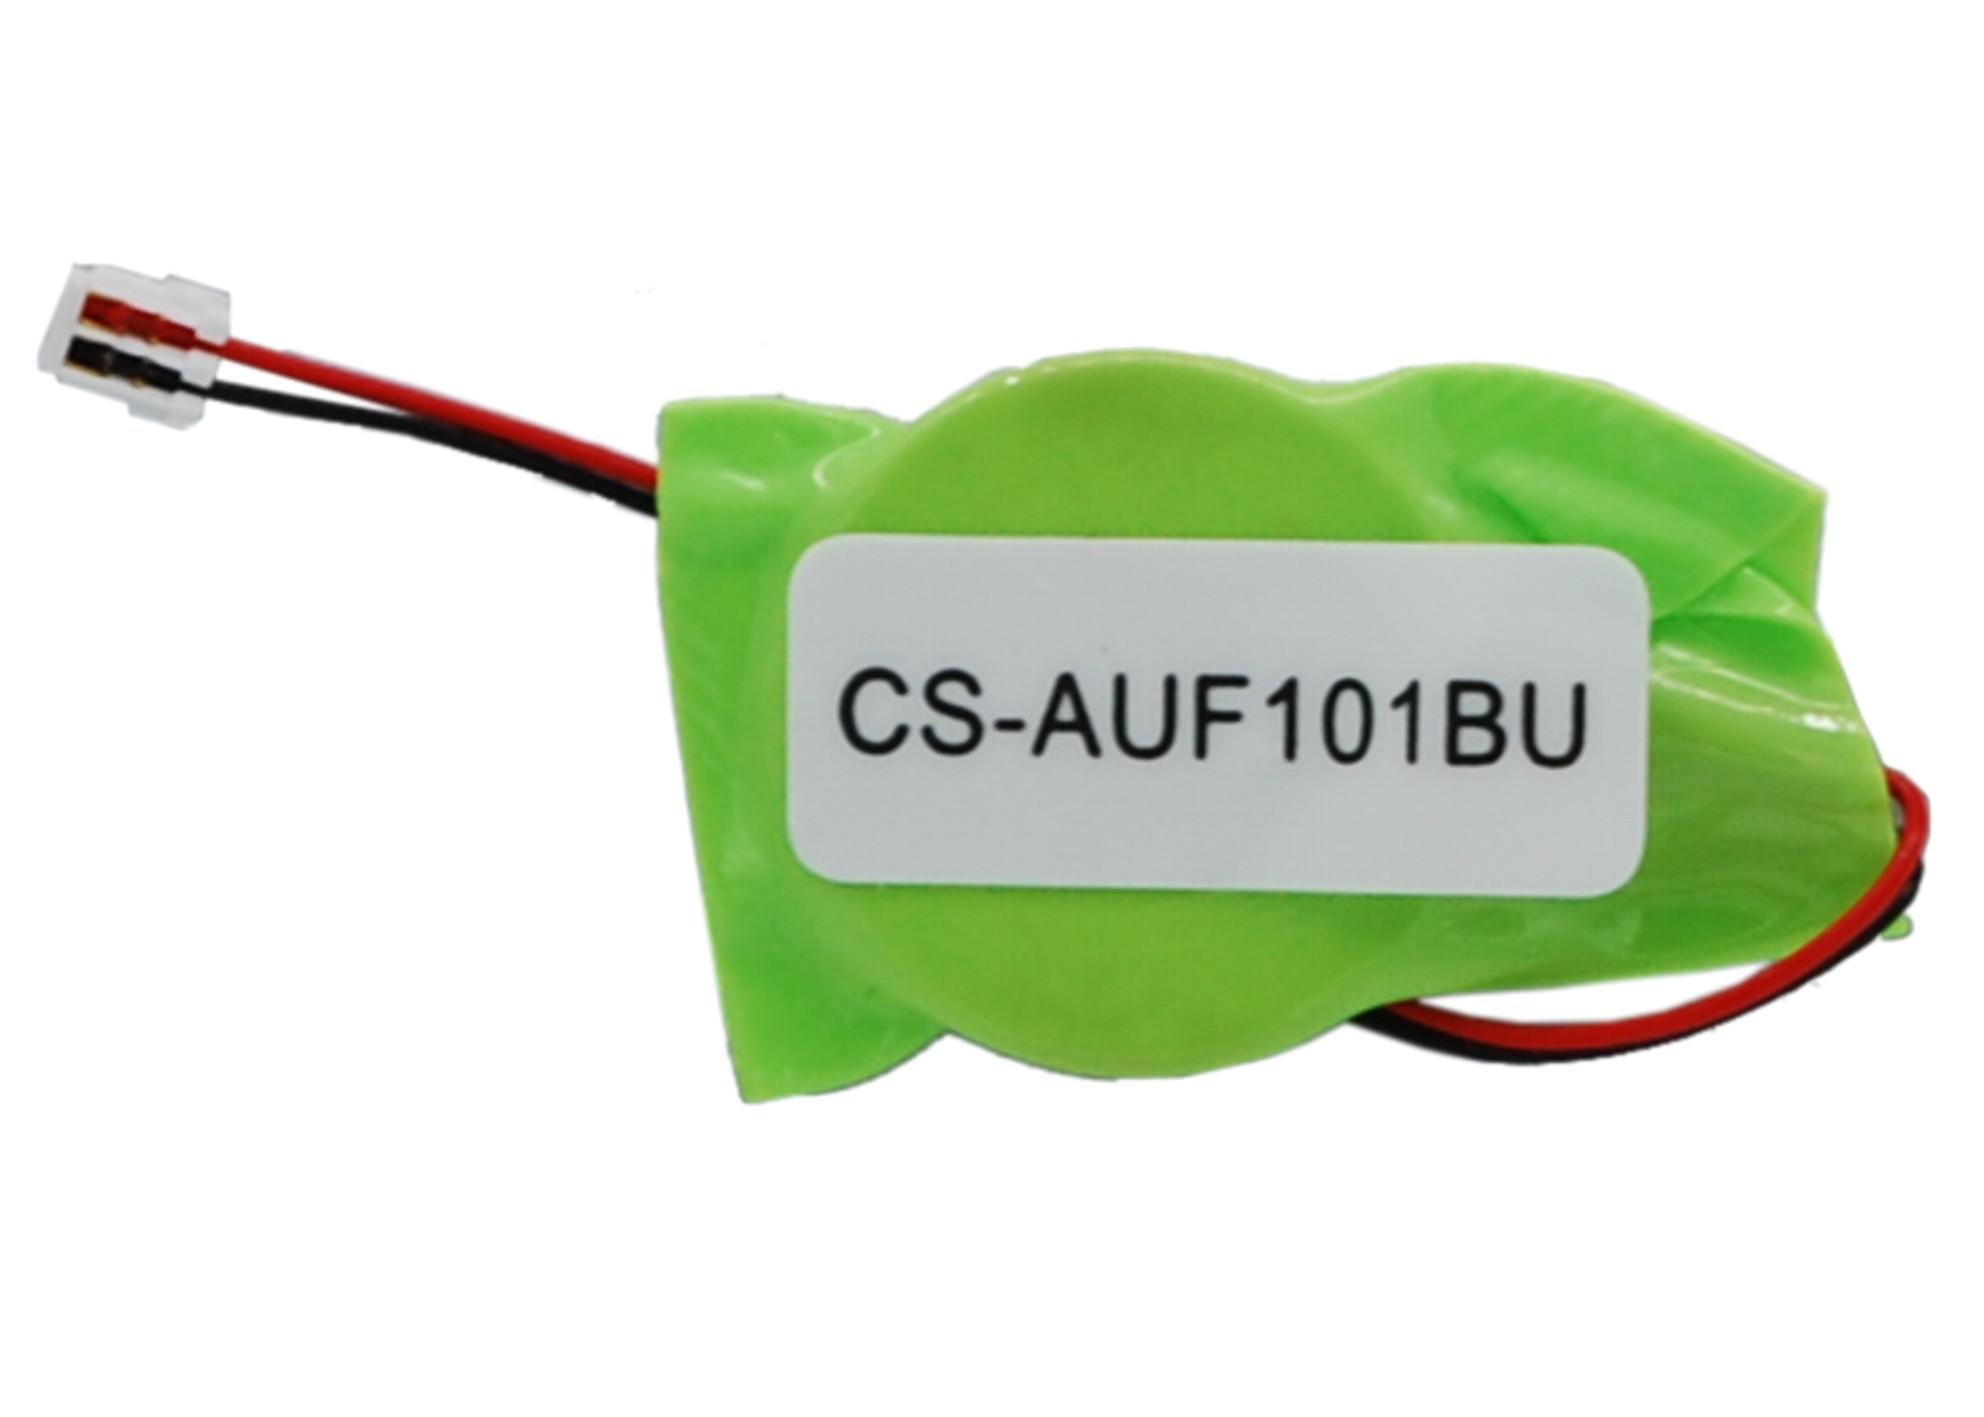 Cameron Sino baterie cmos pro ASUS Eee Pad Transformer TF101-1B180A 3V Li-ion 40mAh zelená - neoriginální